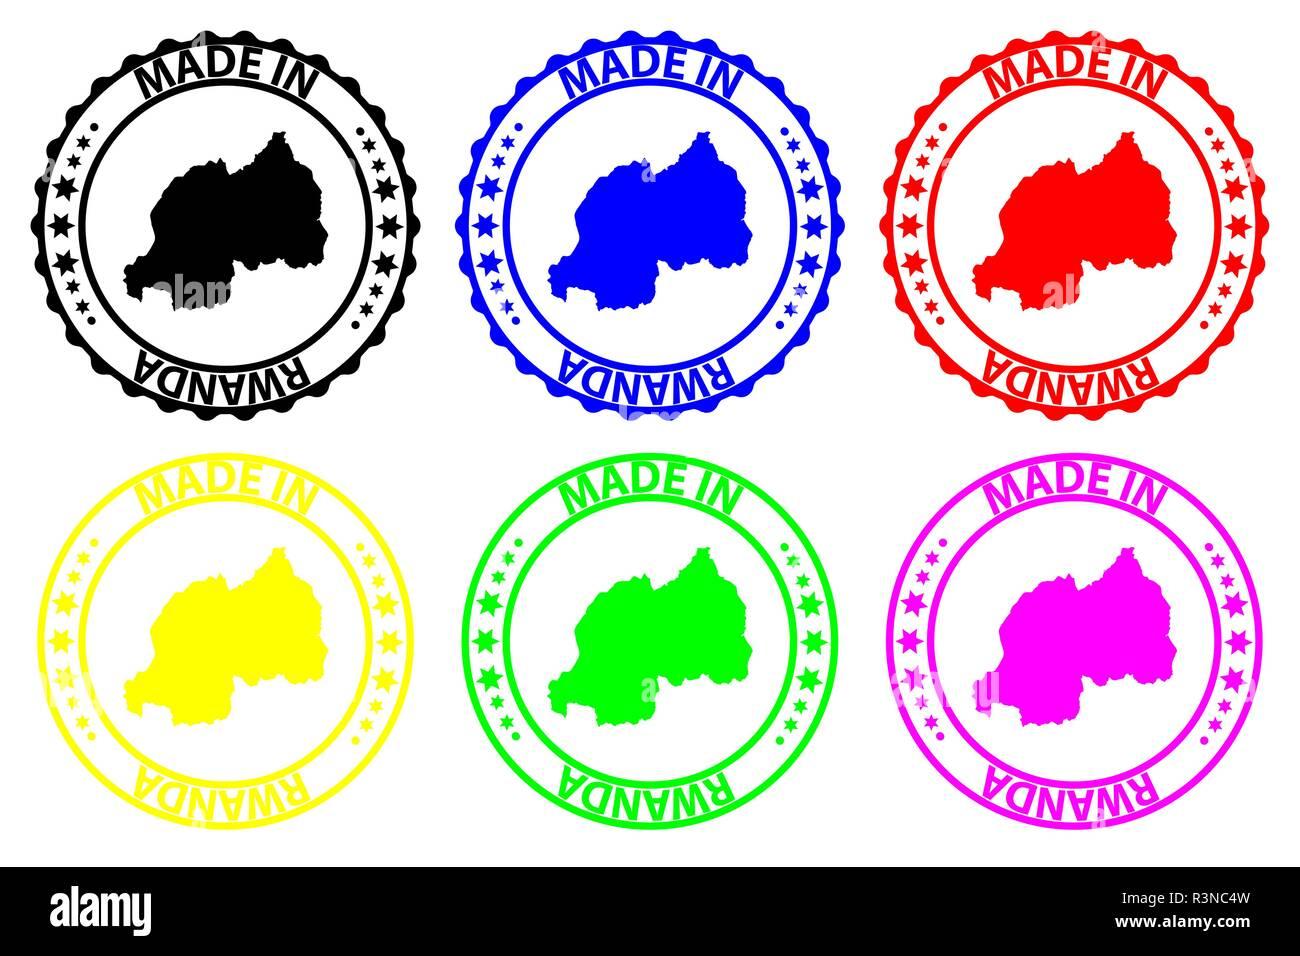 Made in Rwanda - rubber stamp - vector, Rwanda map pattern - black, blue, green, yellow, purple and red - Stock Vector